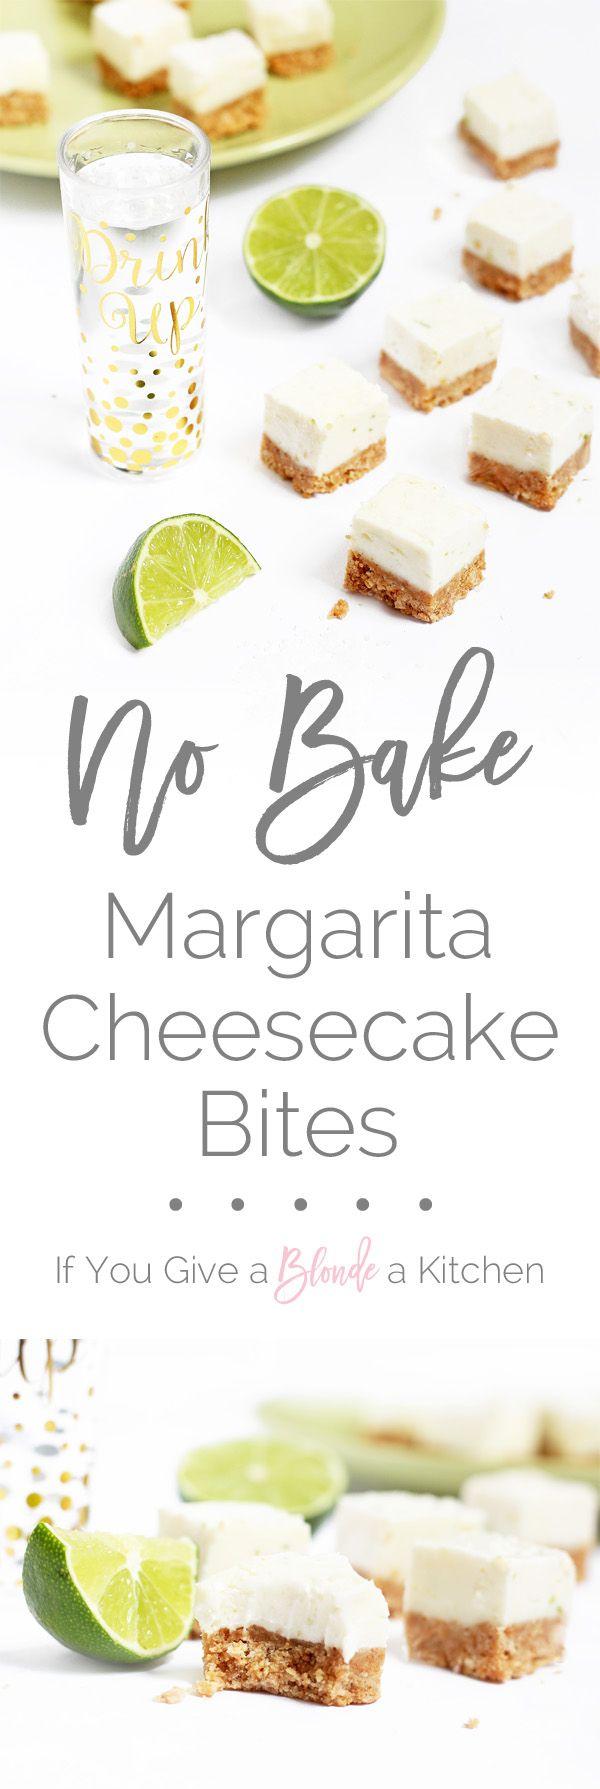 No bake margarita cheesecake bites!!!    Recipe by @haleydwilliams ! YUM!!! Summer in bite size form!! #summer #cheesecake